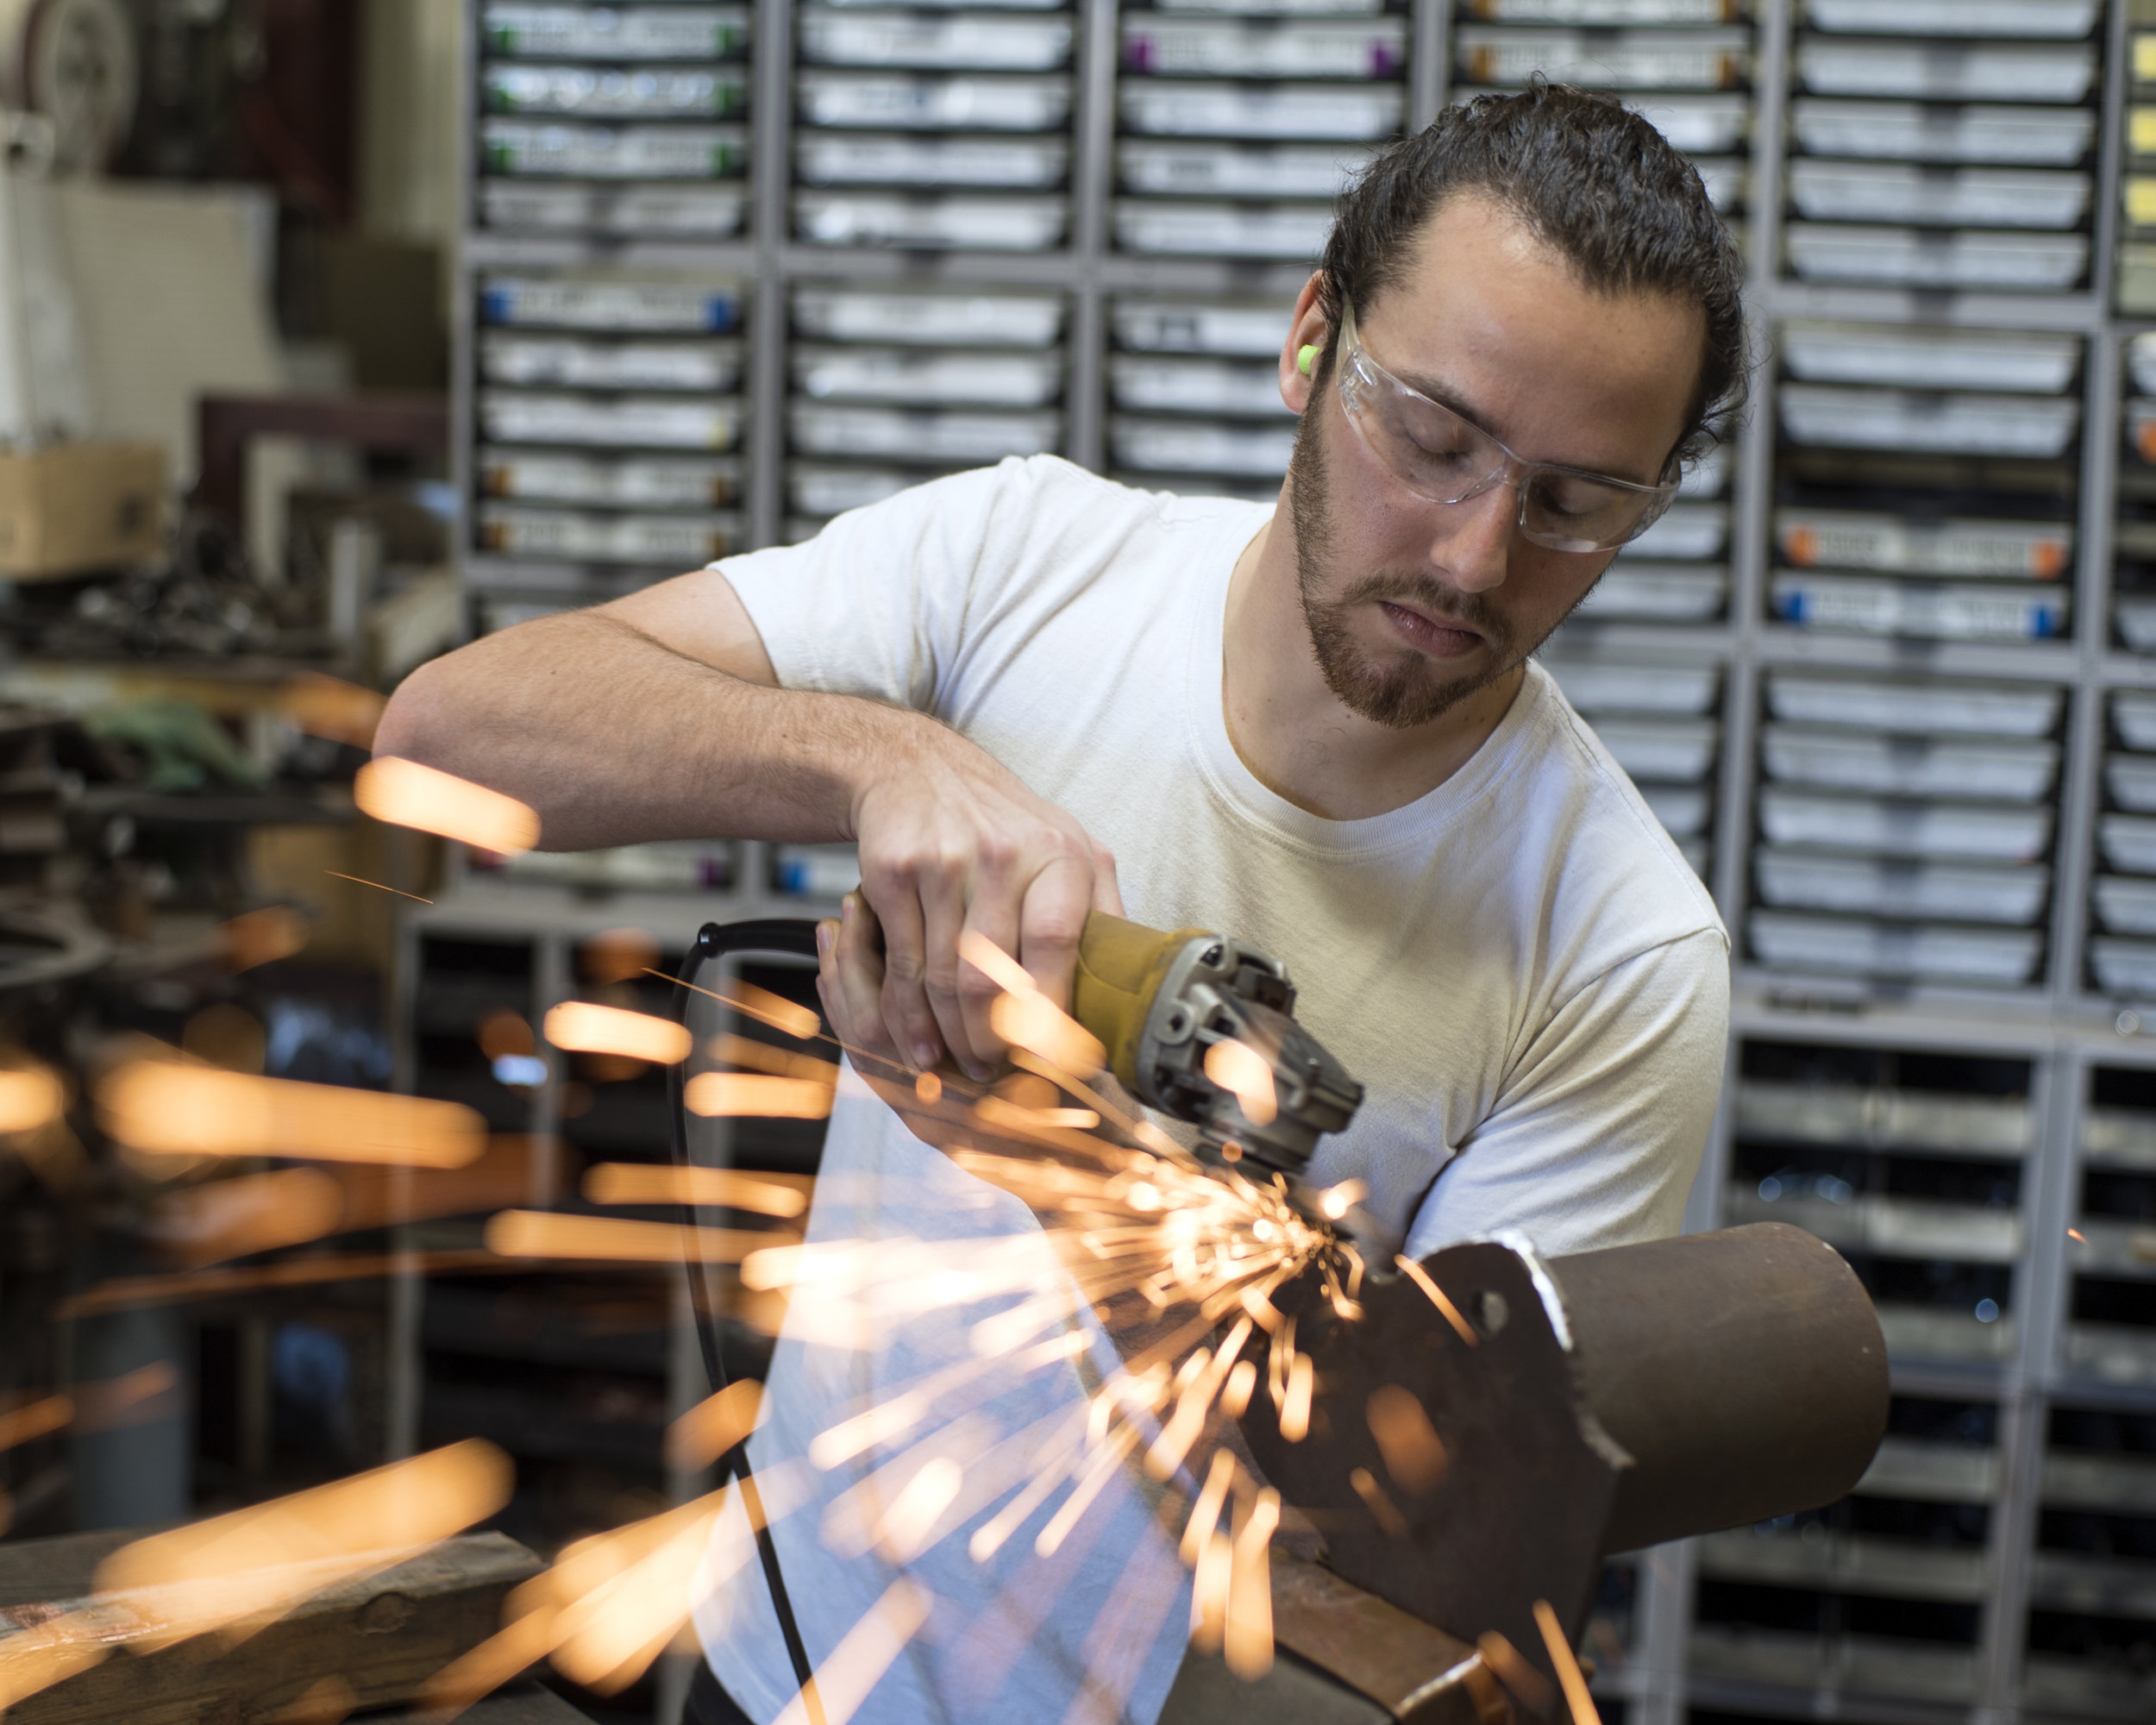 AIDAN FORREST | The Robotics Engineer